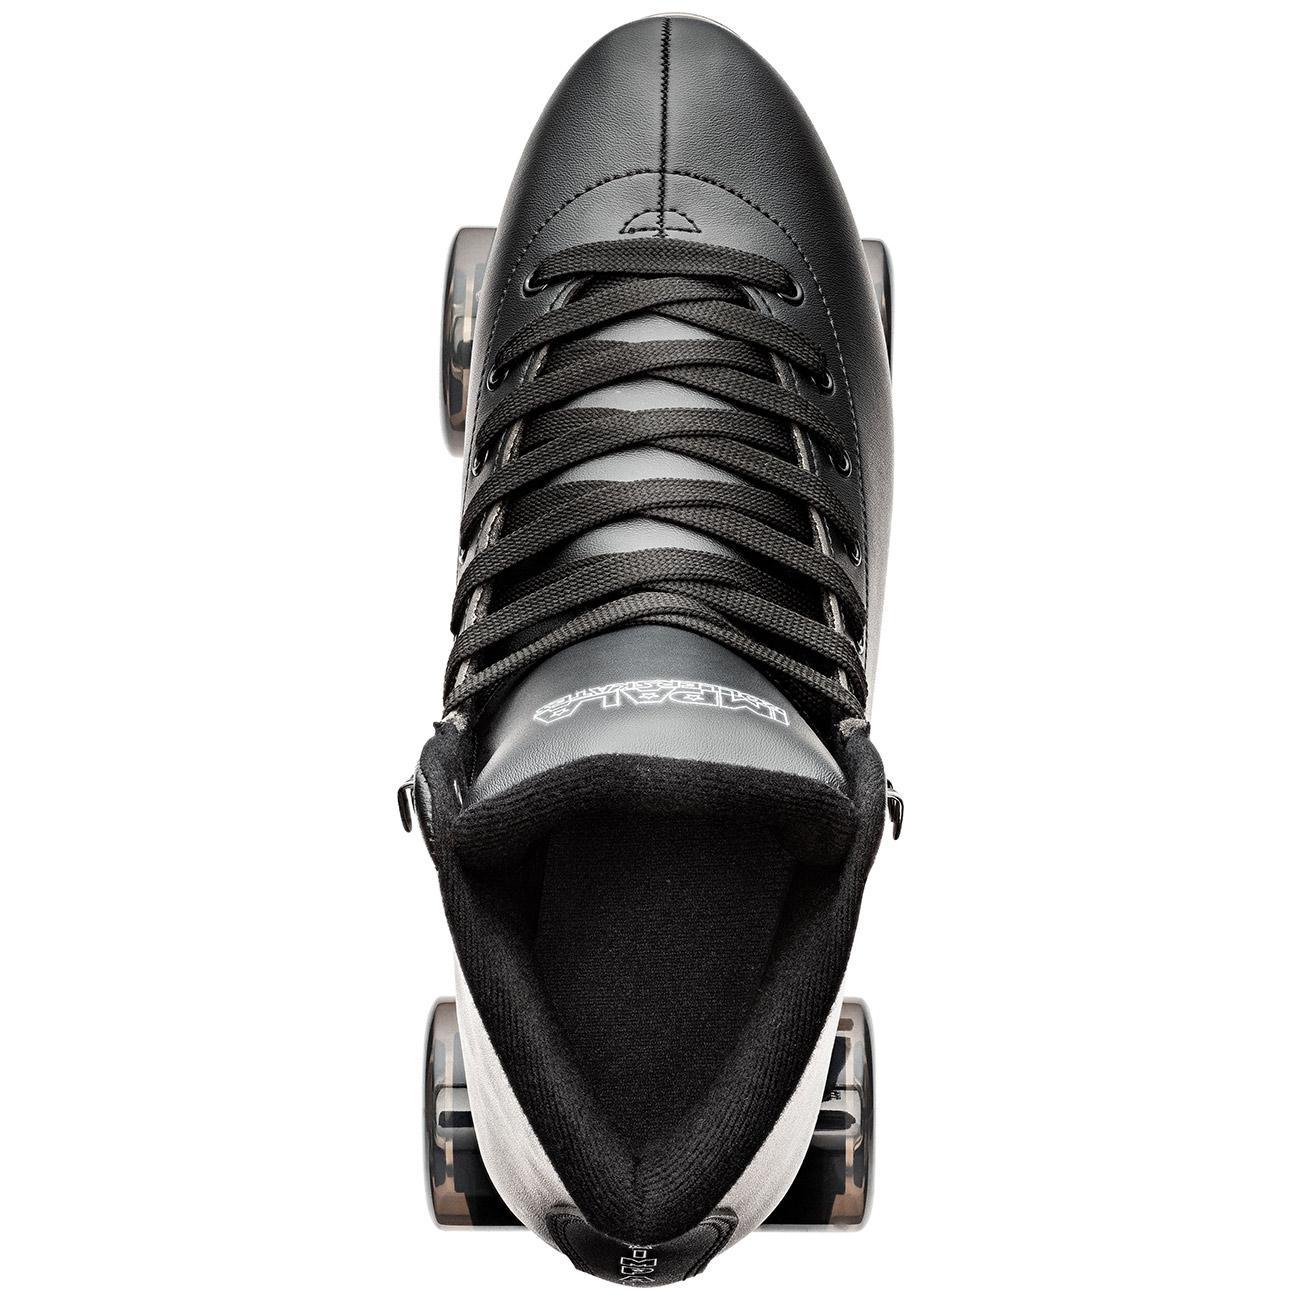 Impala Rollerskaters Black